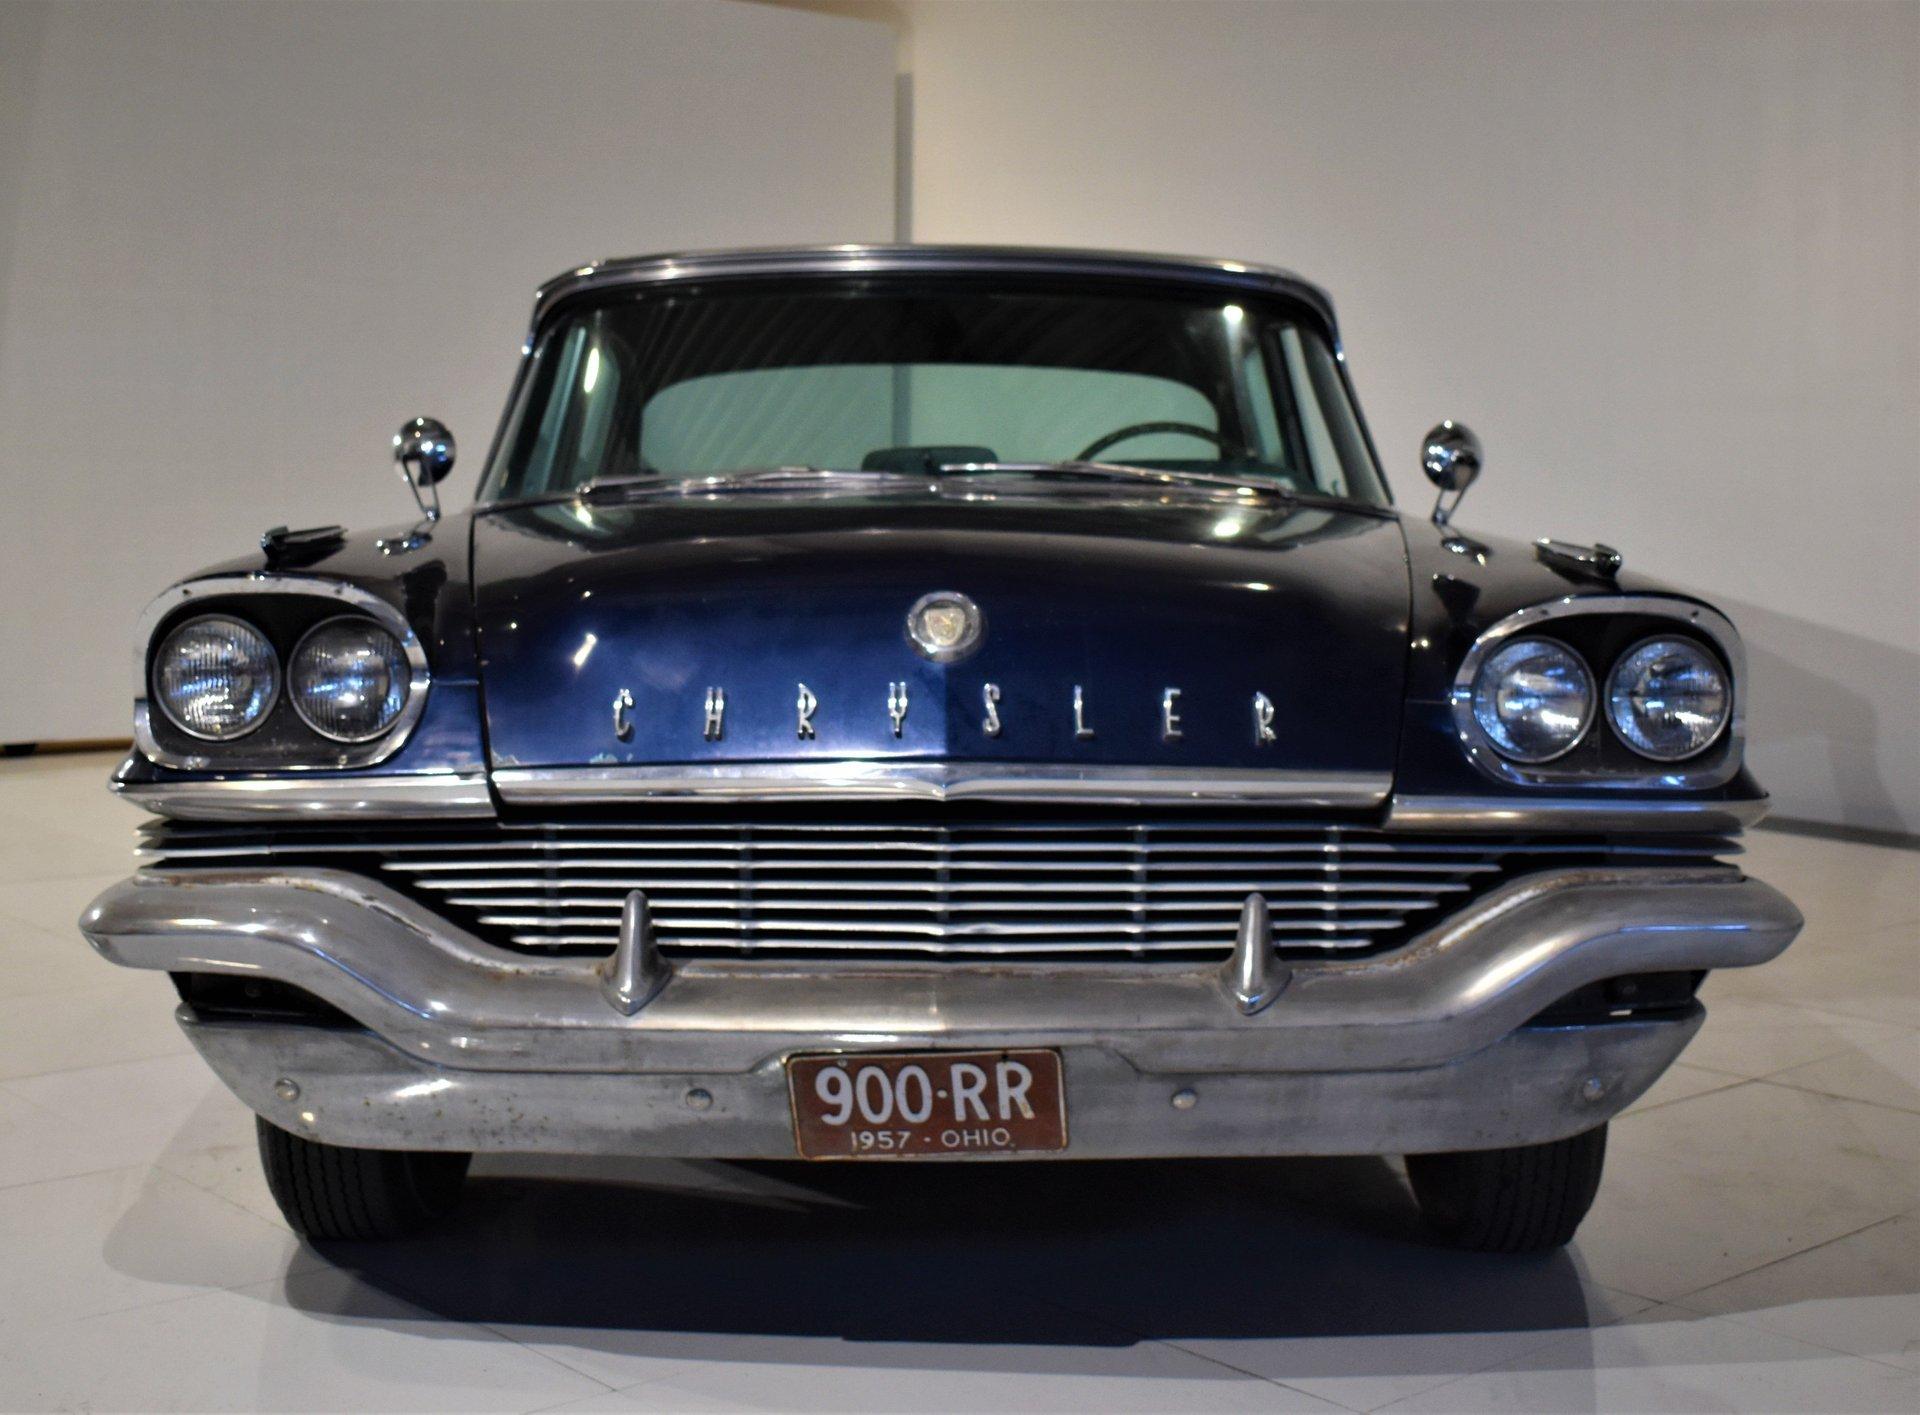 1957 chrysler n57